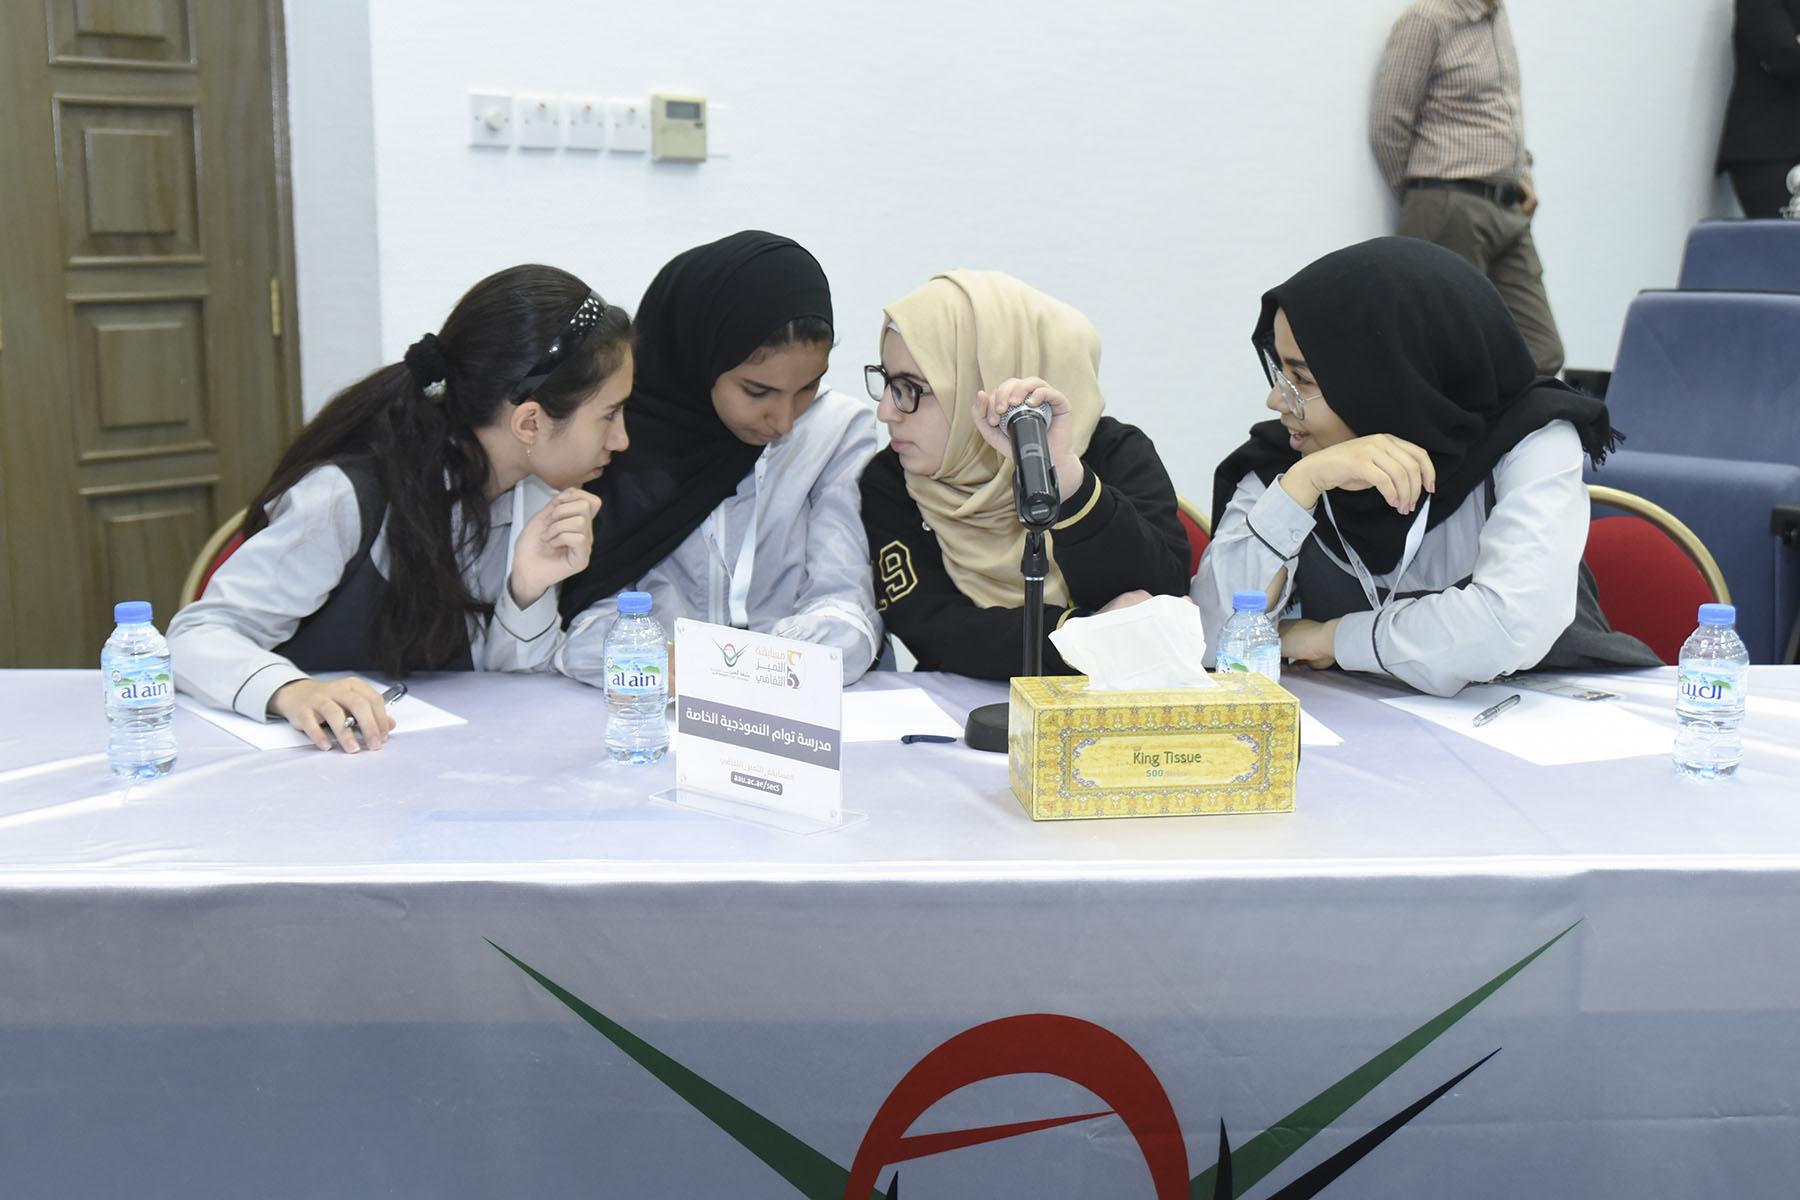 Eighth Day (Tawam Private School VS Ibn Khaldun Islamic Private School)